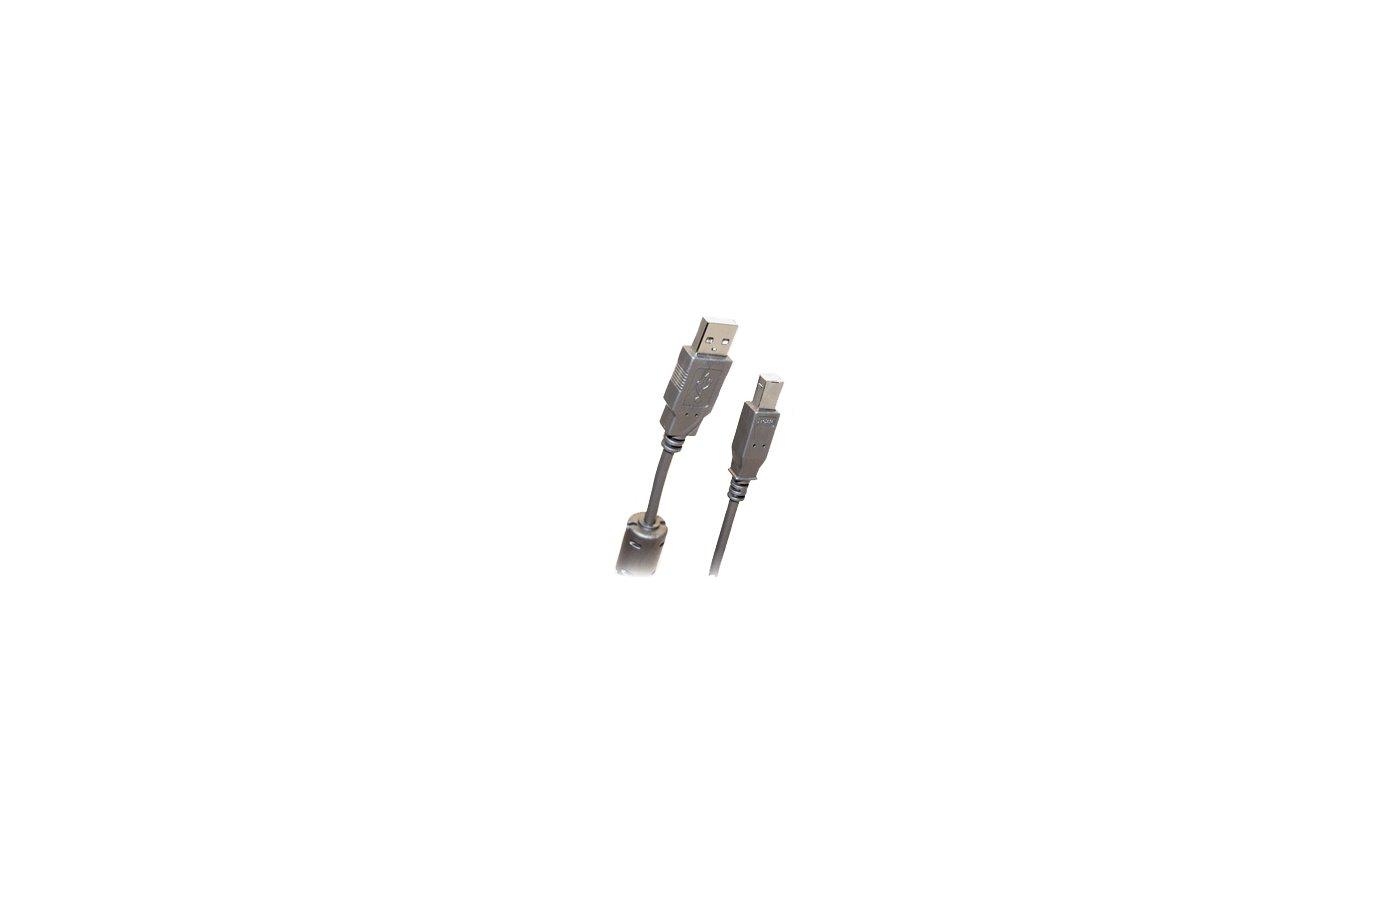 USB Кабель BELSIS BW 1412 USB2.0 A(m) - В(m) 3м